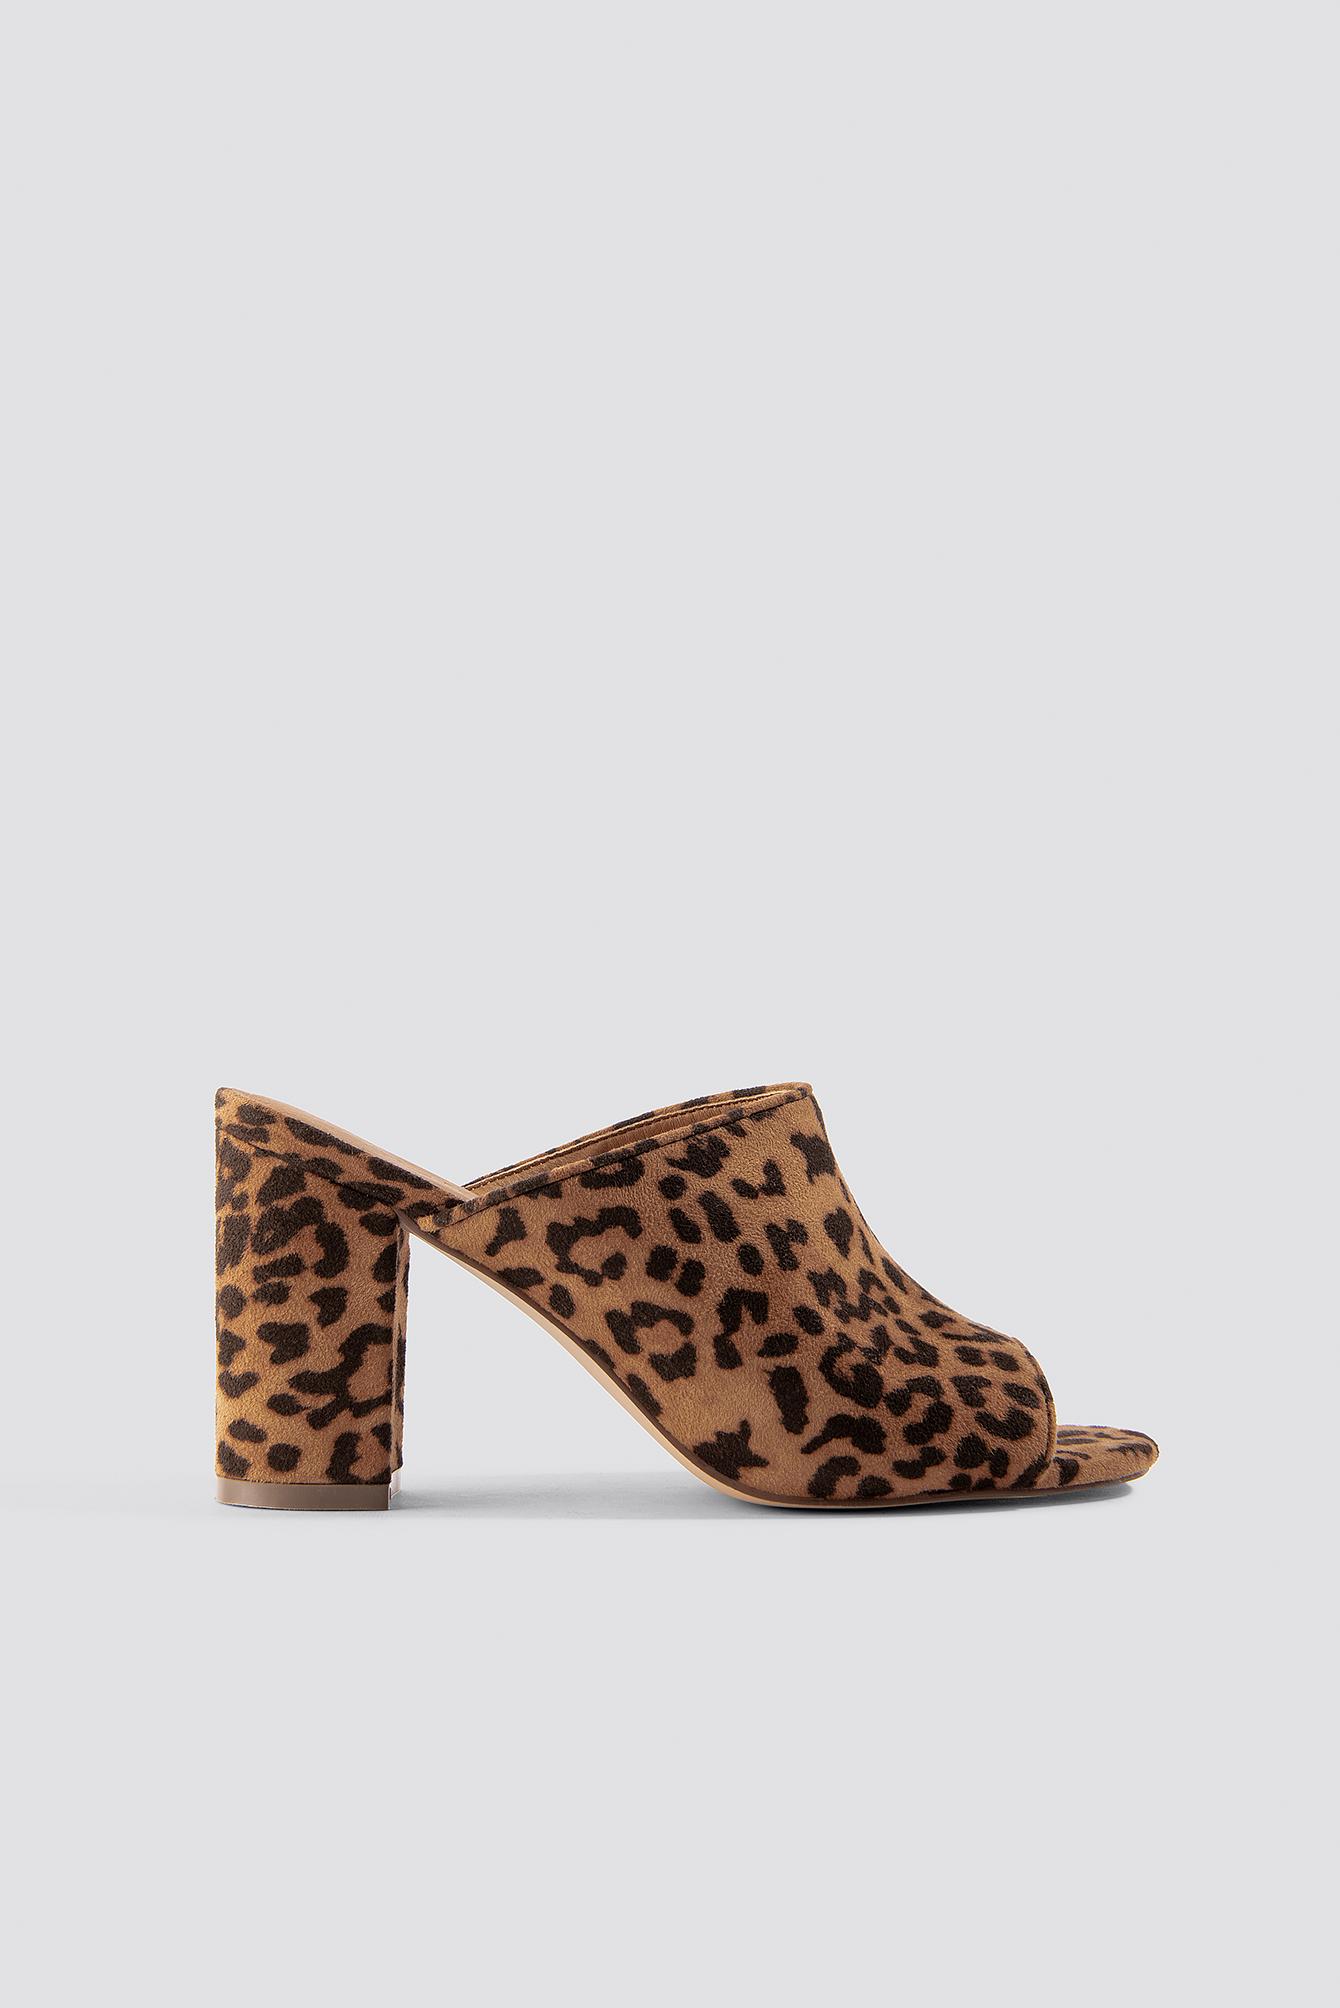 Leopard Block Heel Mules Brown   na-kd.com